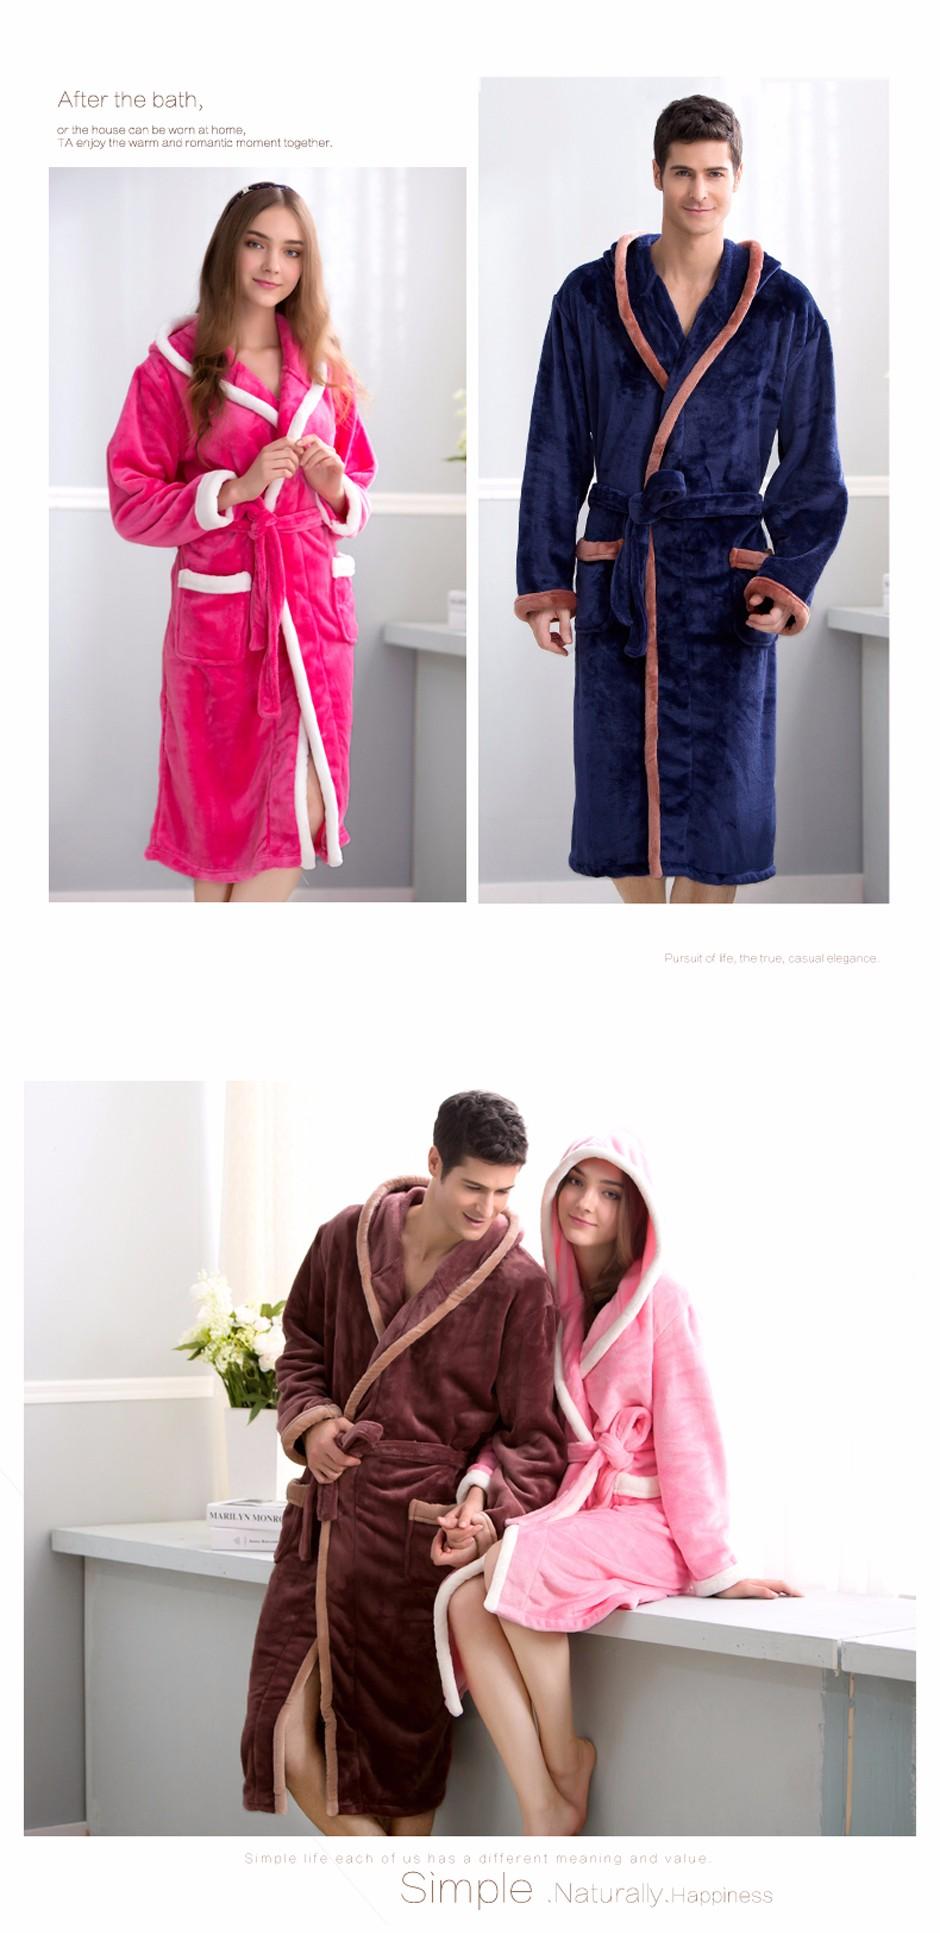 ... women 224  Dresses Length  Mid-Calf  Brand Name  BXMAN  Season  Winter   Material  Polyester. Product Description d4b922a44